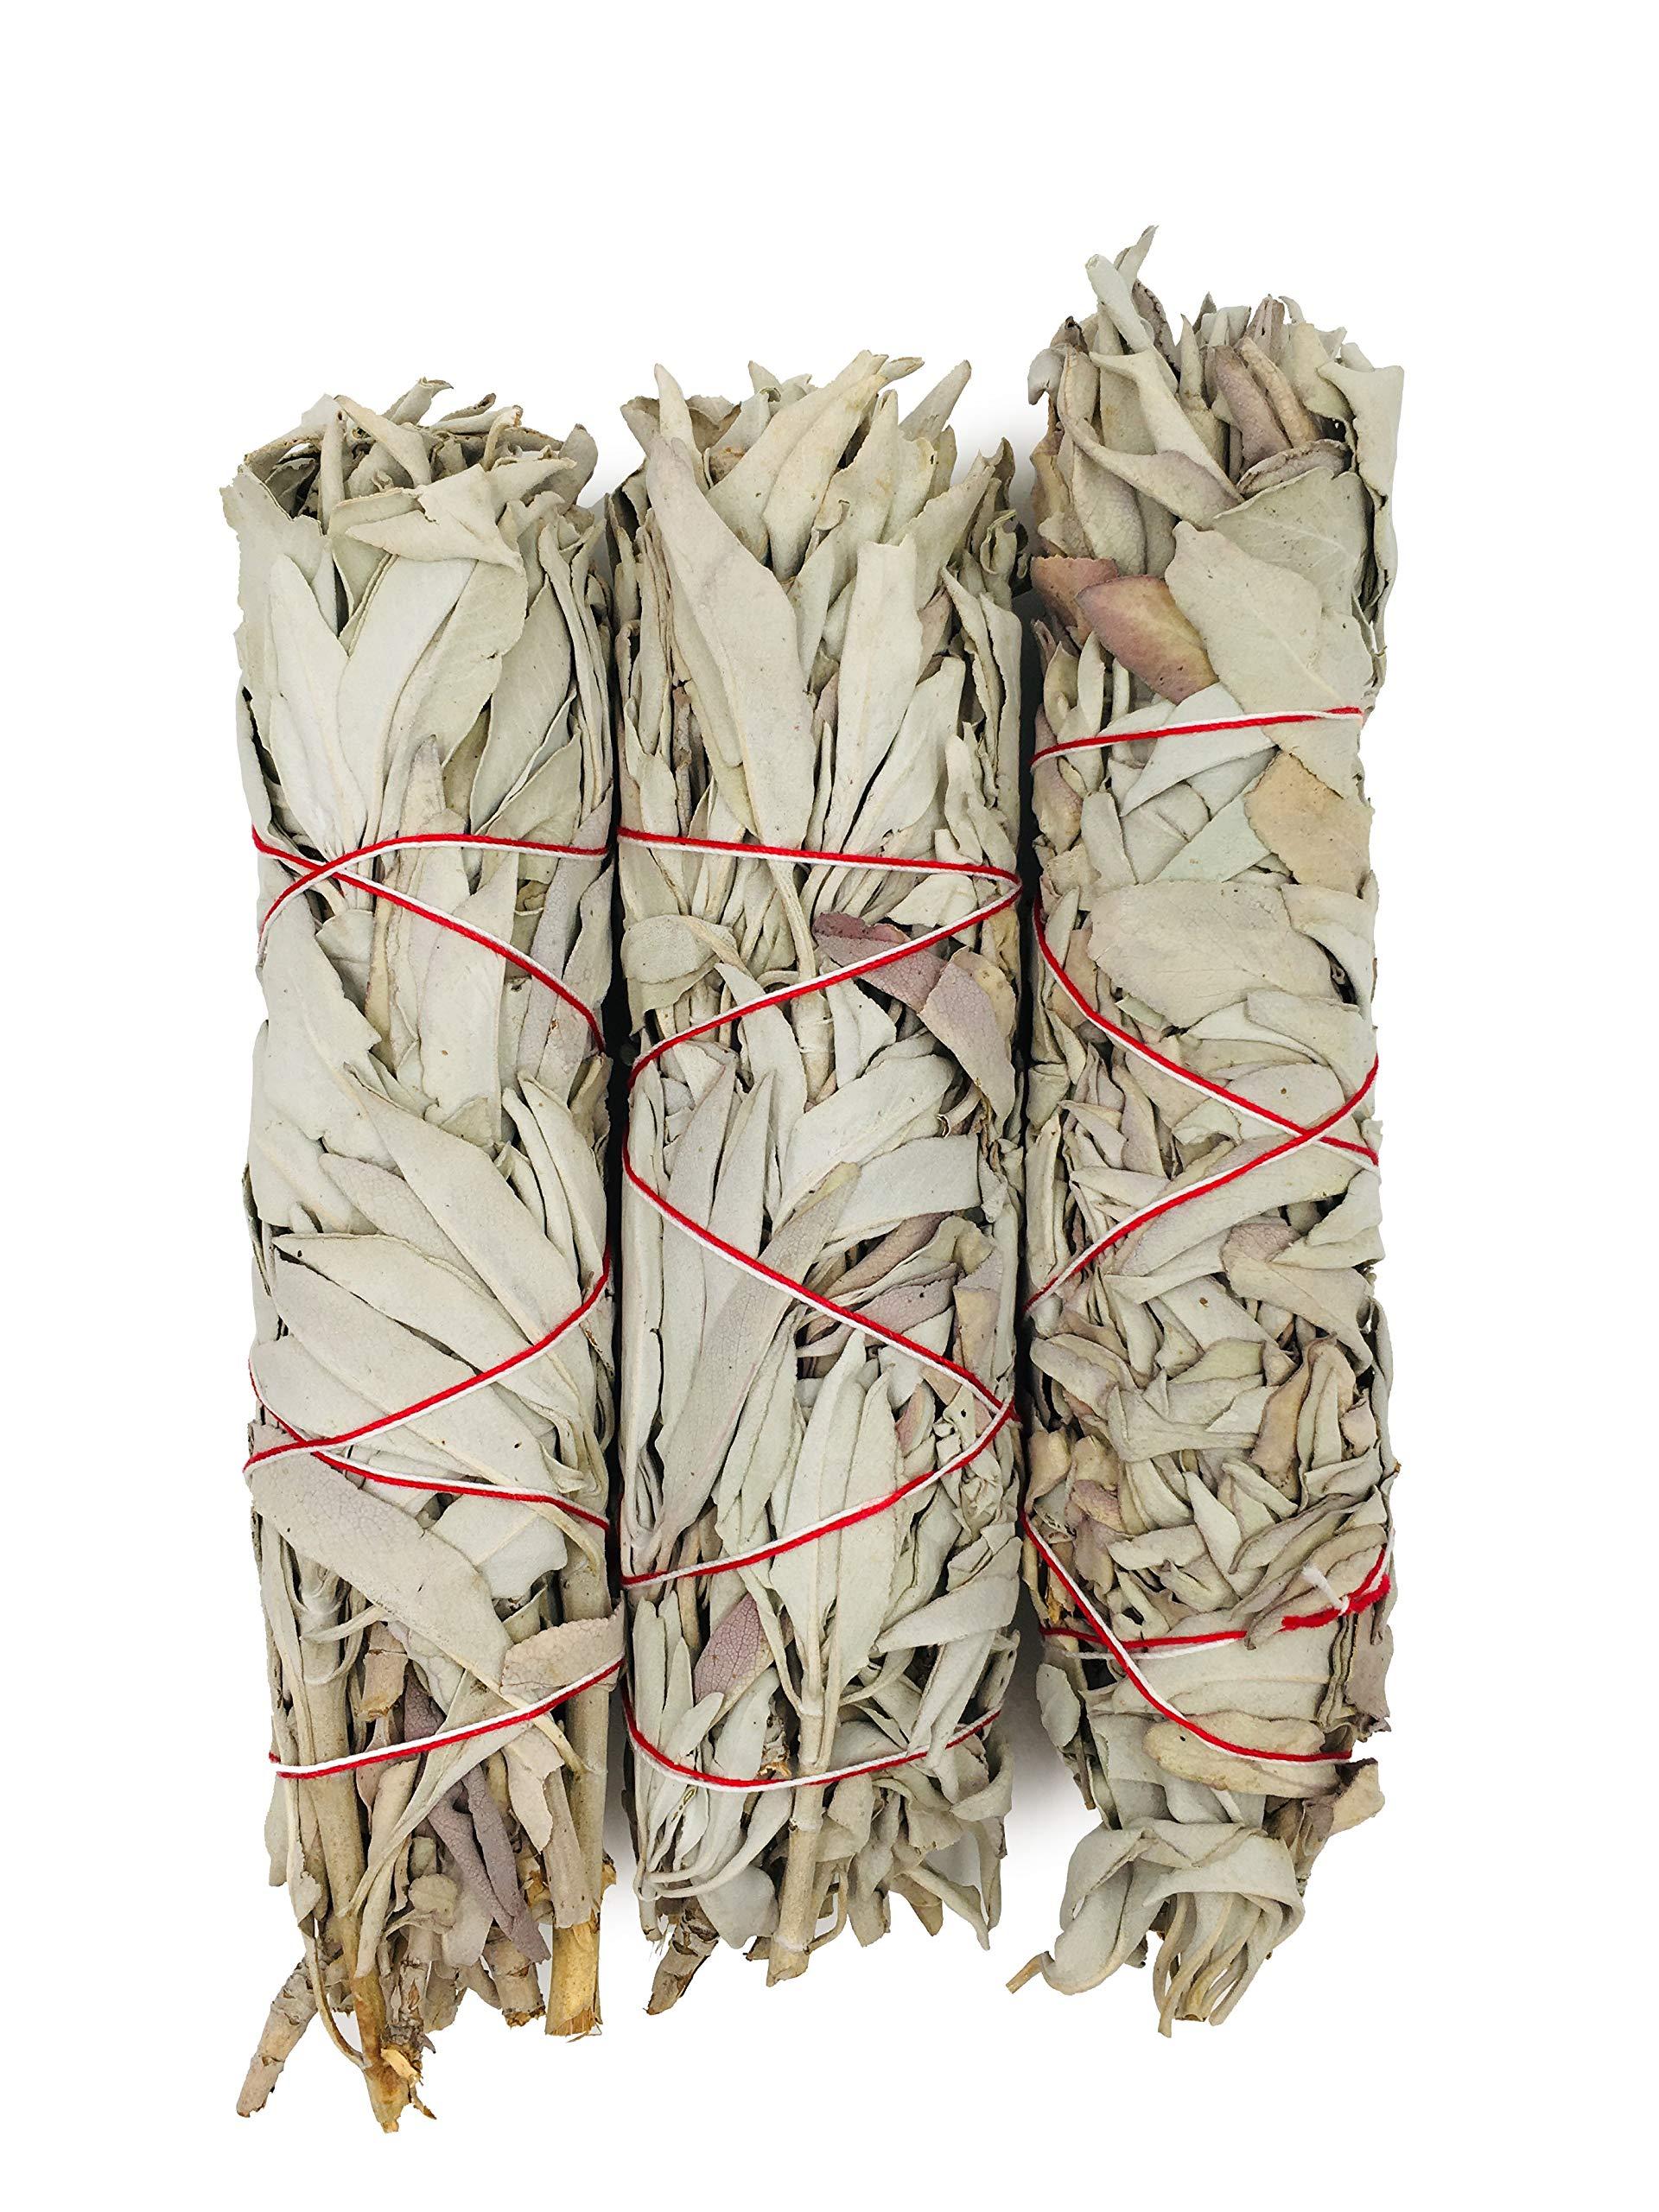 Alternative Imagination Premium, 7 Inch California White Sage Smudge Sticks. by Alternative Imagination